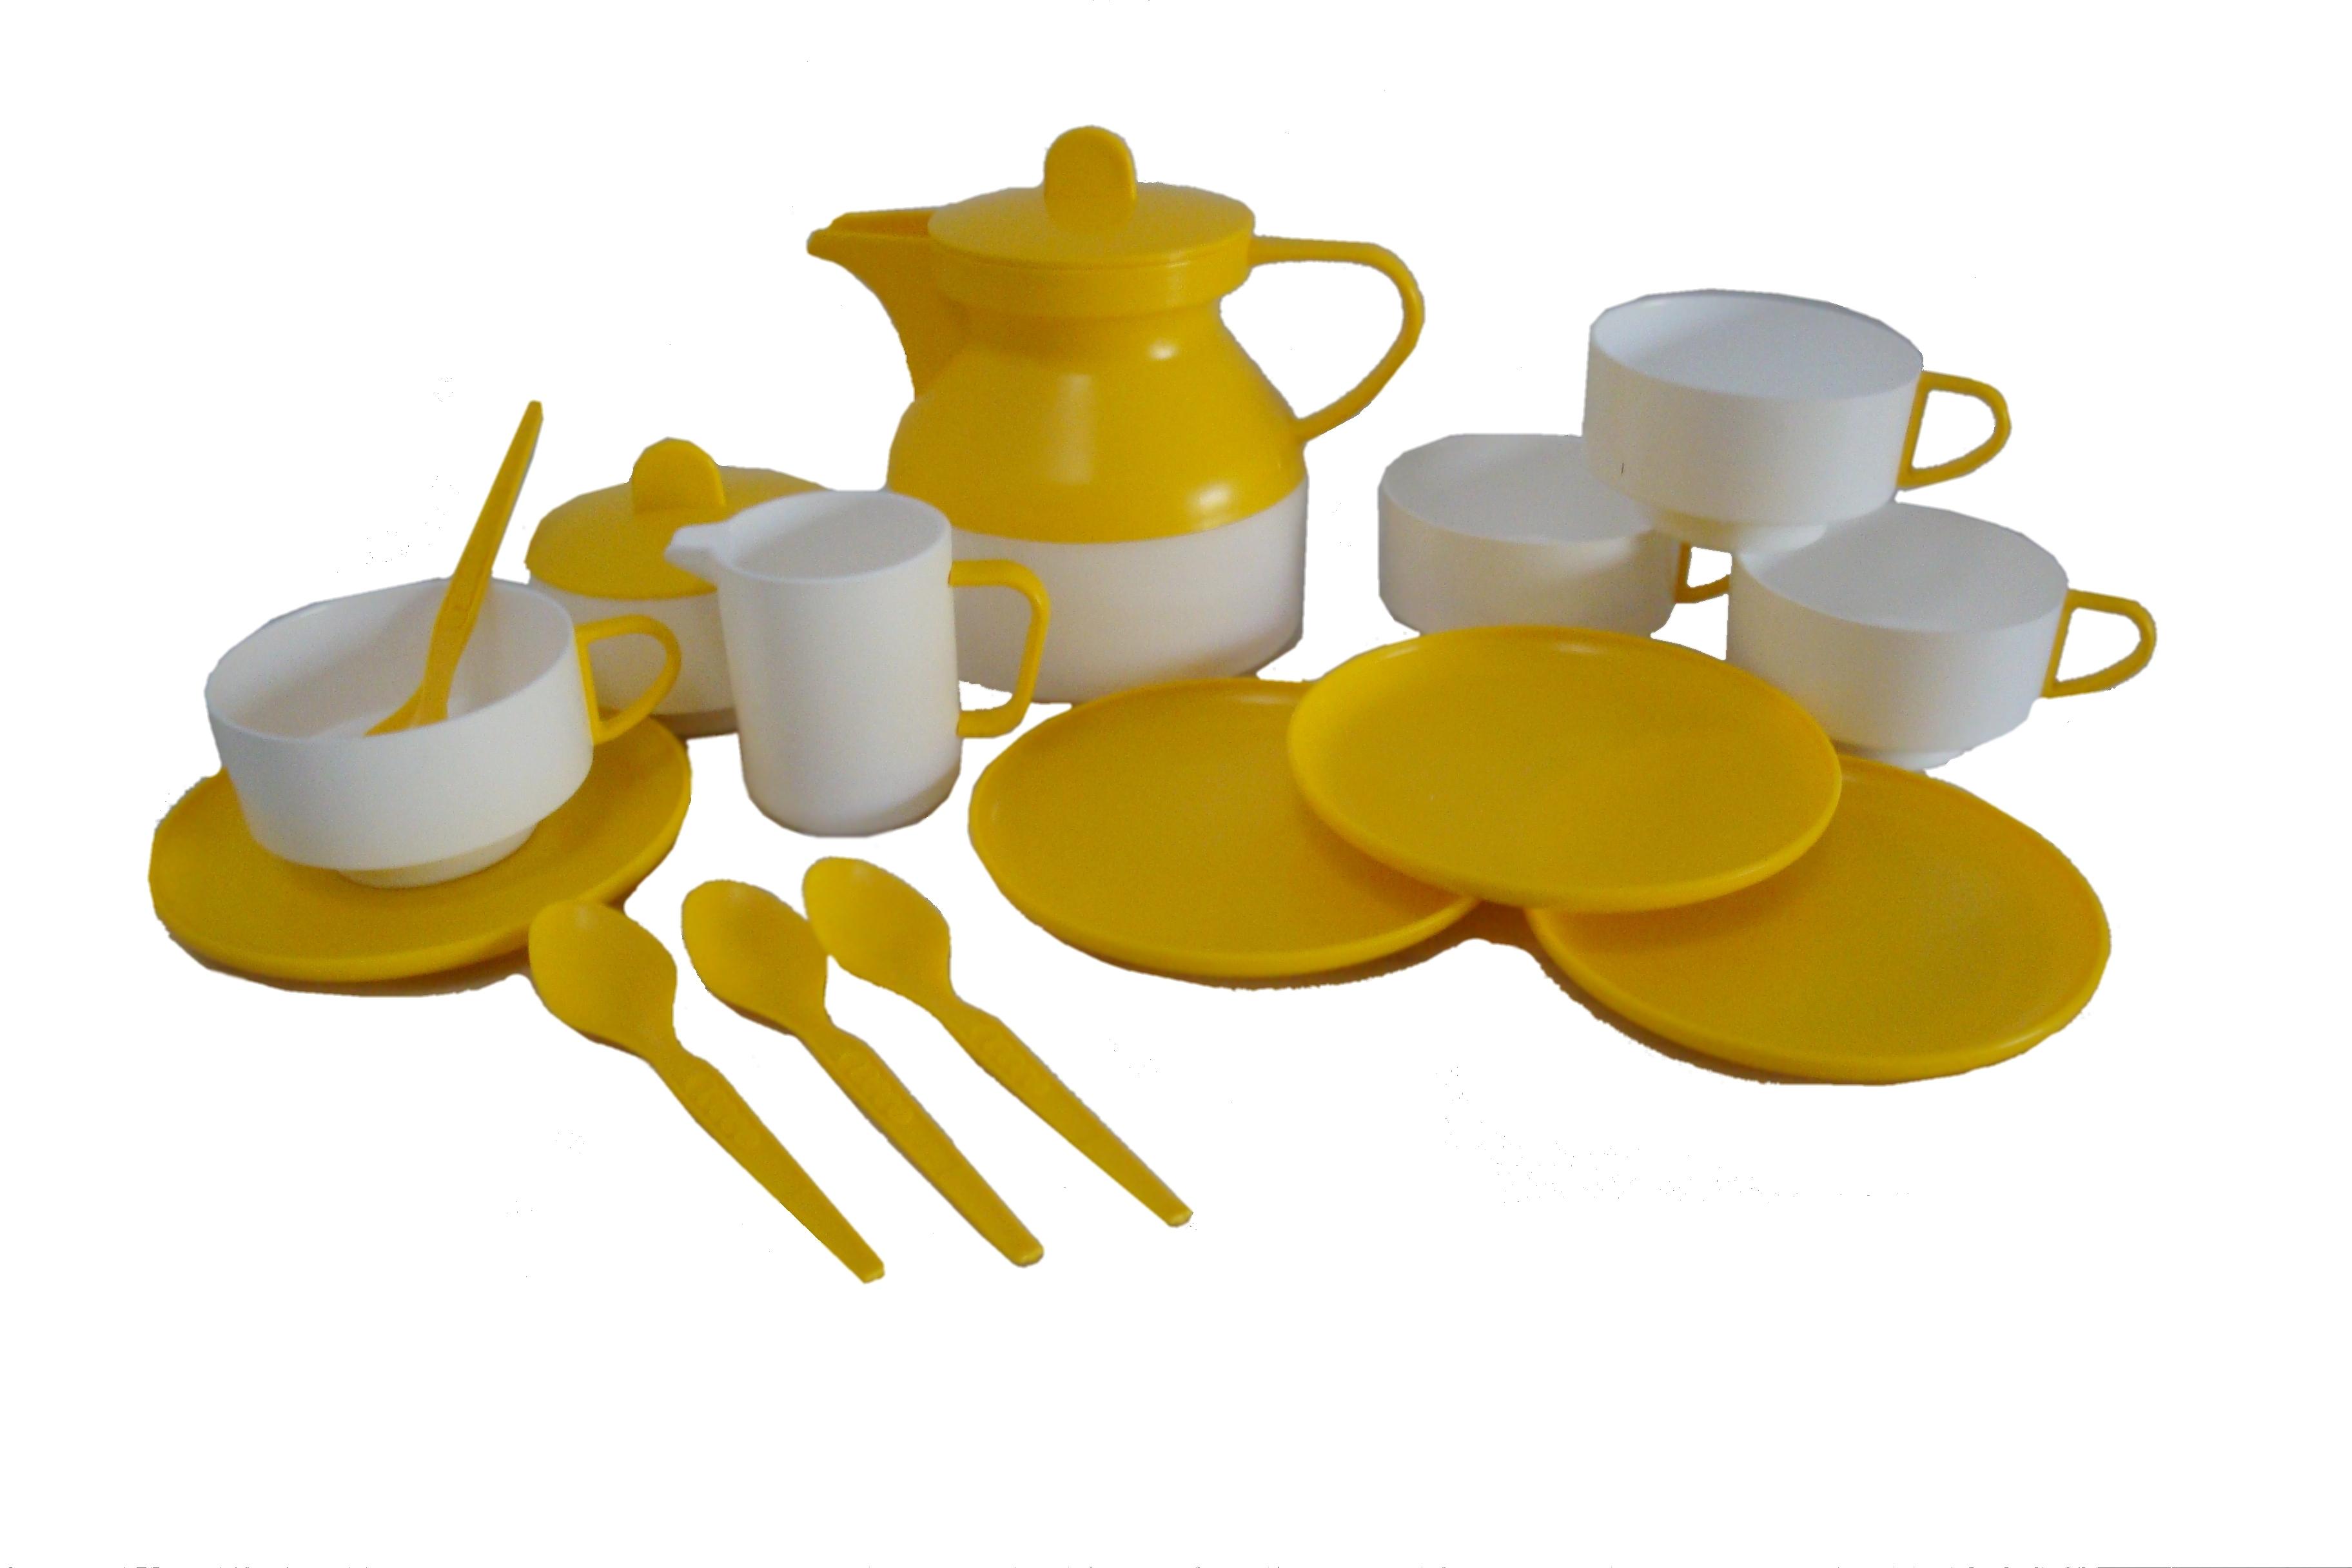 teeservice peggy wei gelb ddr puppengeschirr plastik reifra kunststofftechnik gmbh. Black Bedroom Furniture Sets. Home Design Ideas